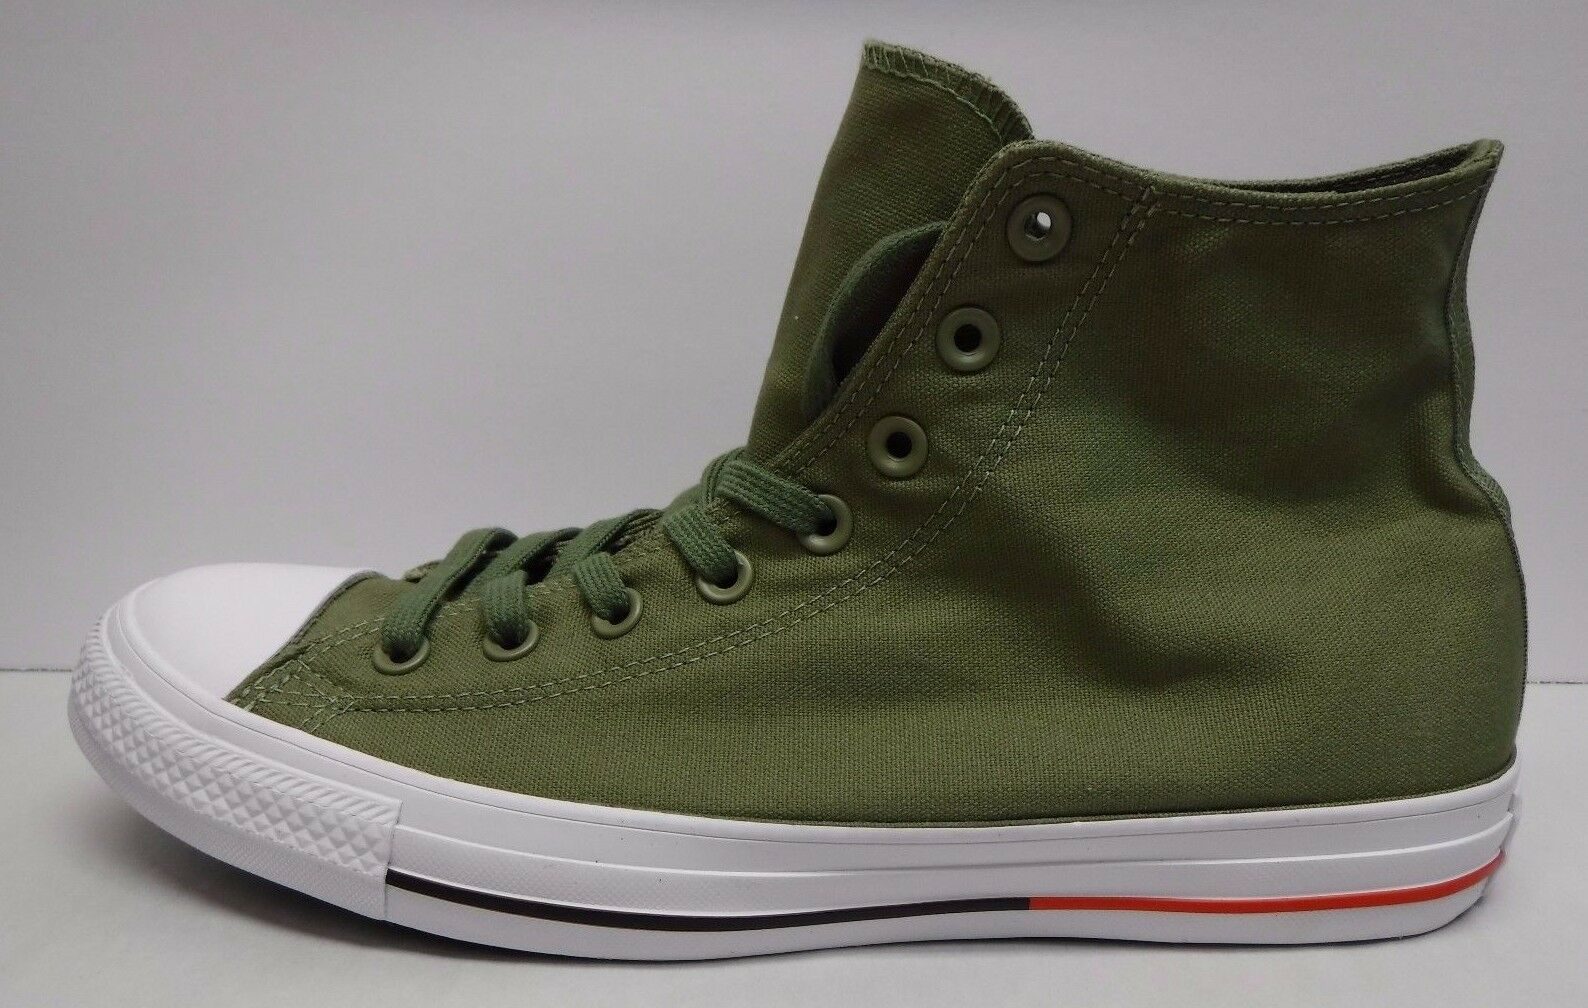 Converse Größe New 10.5 Green Hi Top Sneakers New Größe  Uomo Schuhes 34a406